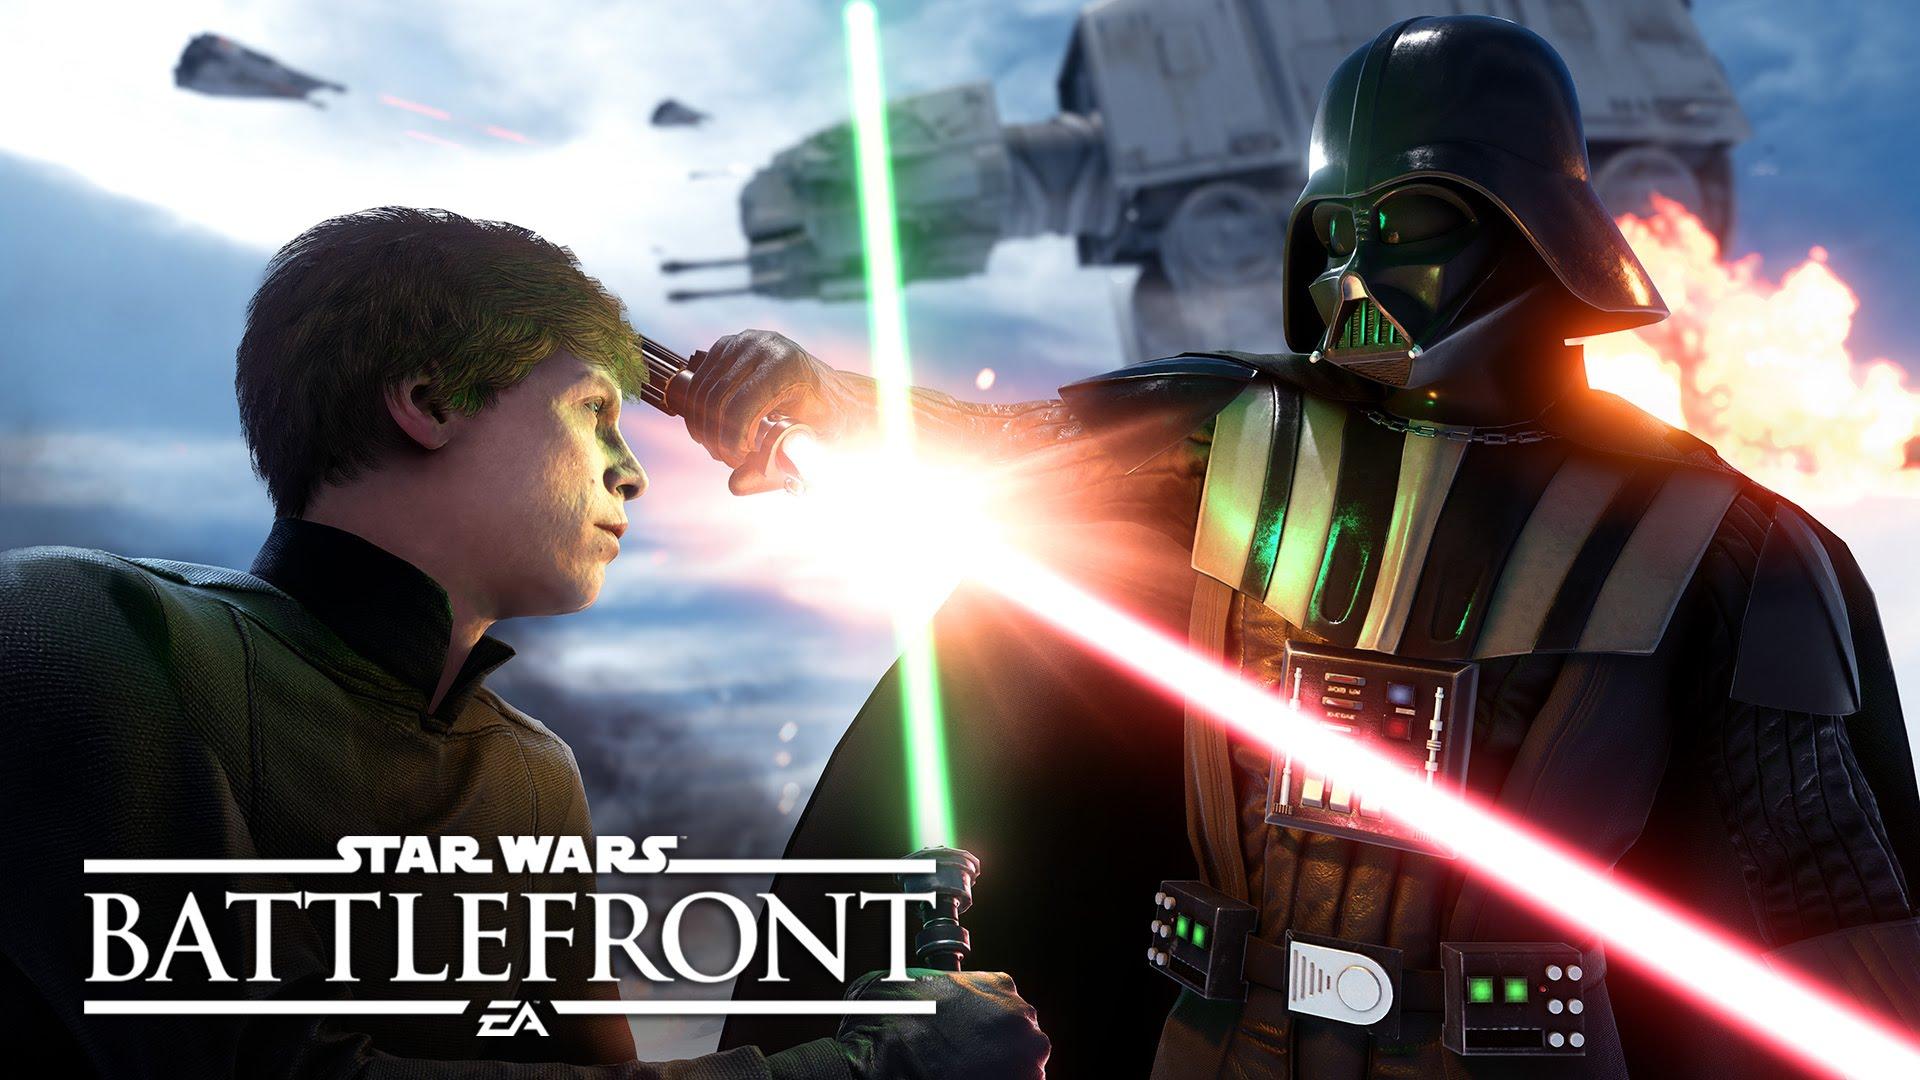 STAR WARS BATTLEFRONT™